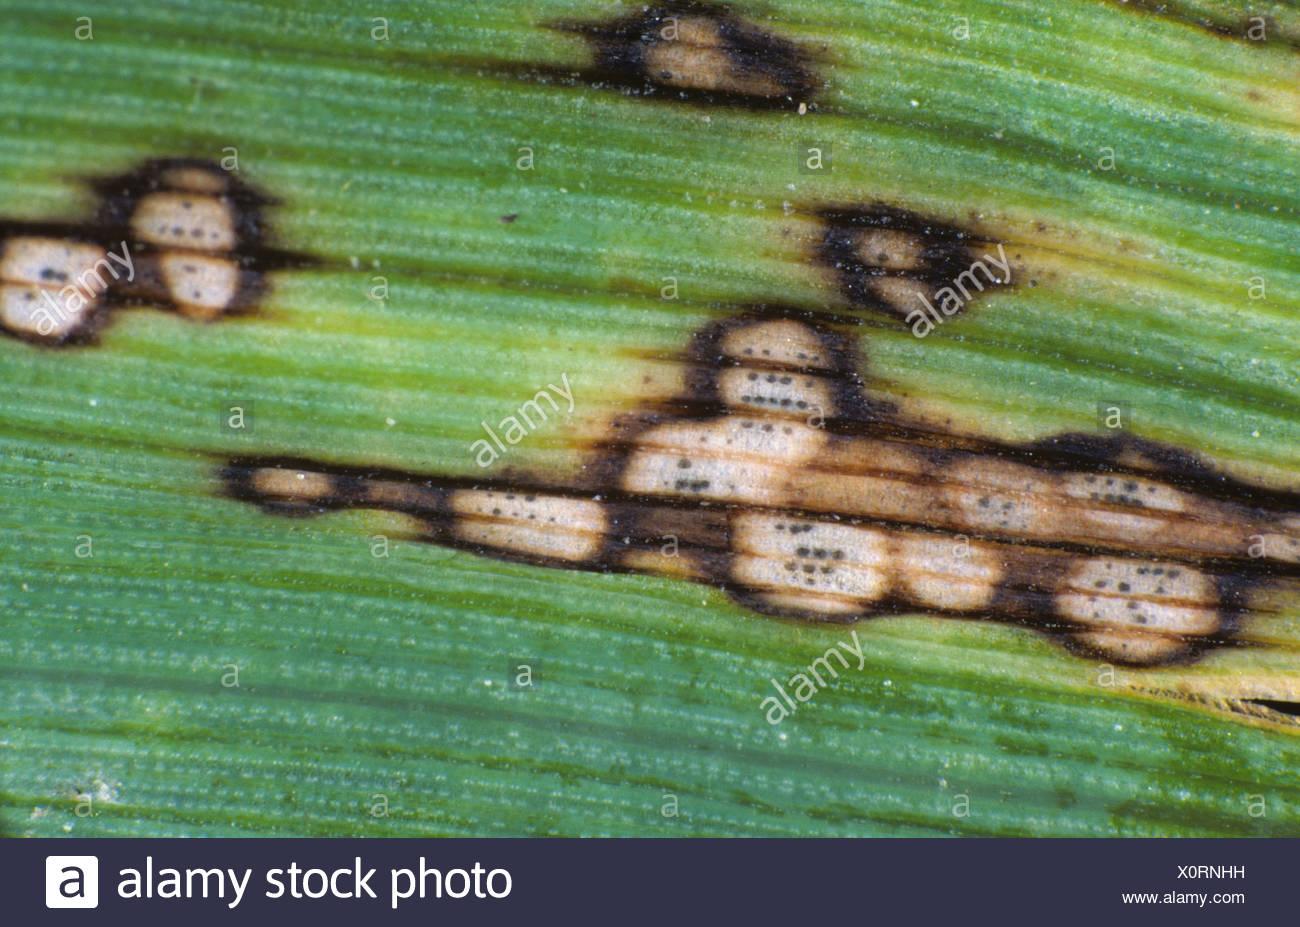 Halo spot Selenophoma donacis lesions pycnidia on a barley leaf - Stock Image